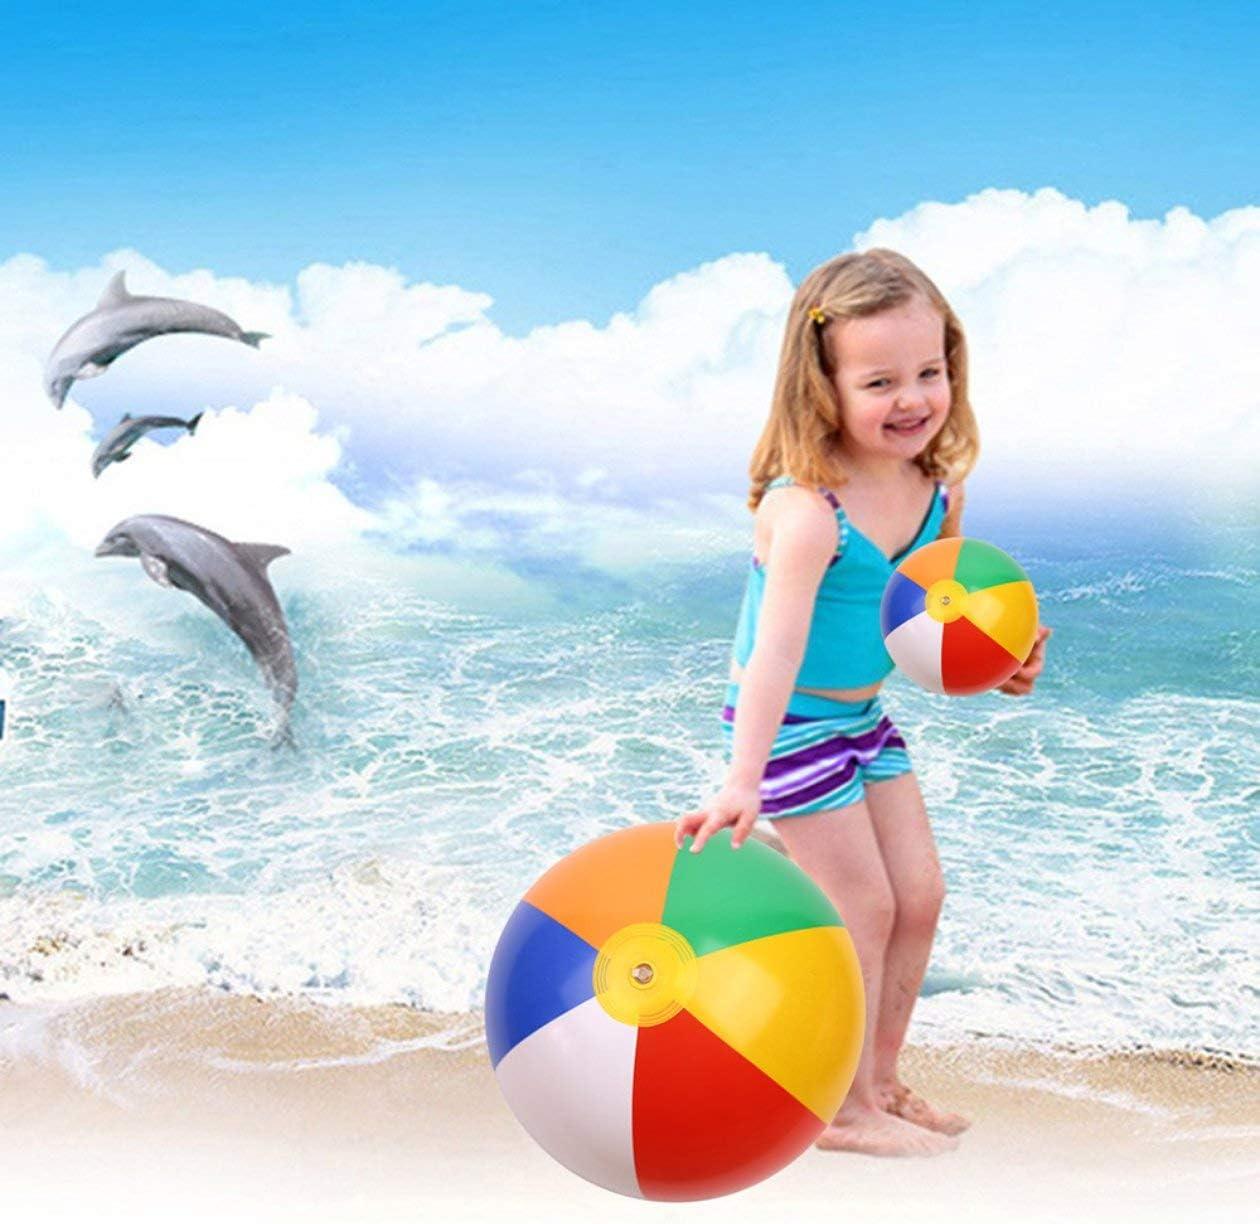 BIYI Inflable Pelota de playa Inflador port/átil Globo de agua Verano al aire libre Playa Nataci/ón Juguete Herramienta de bombeo Accesorios Colorido